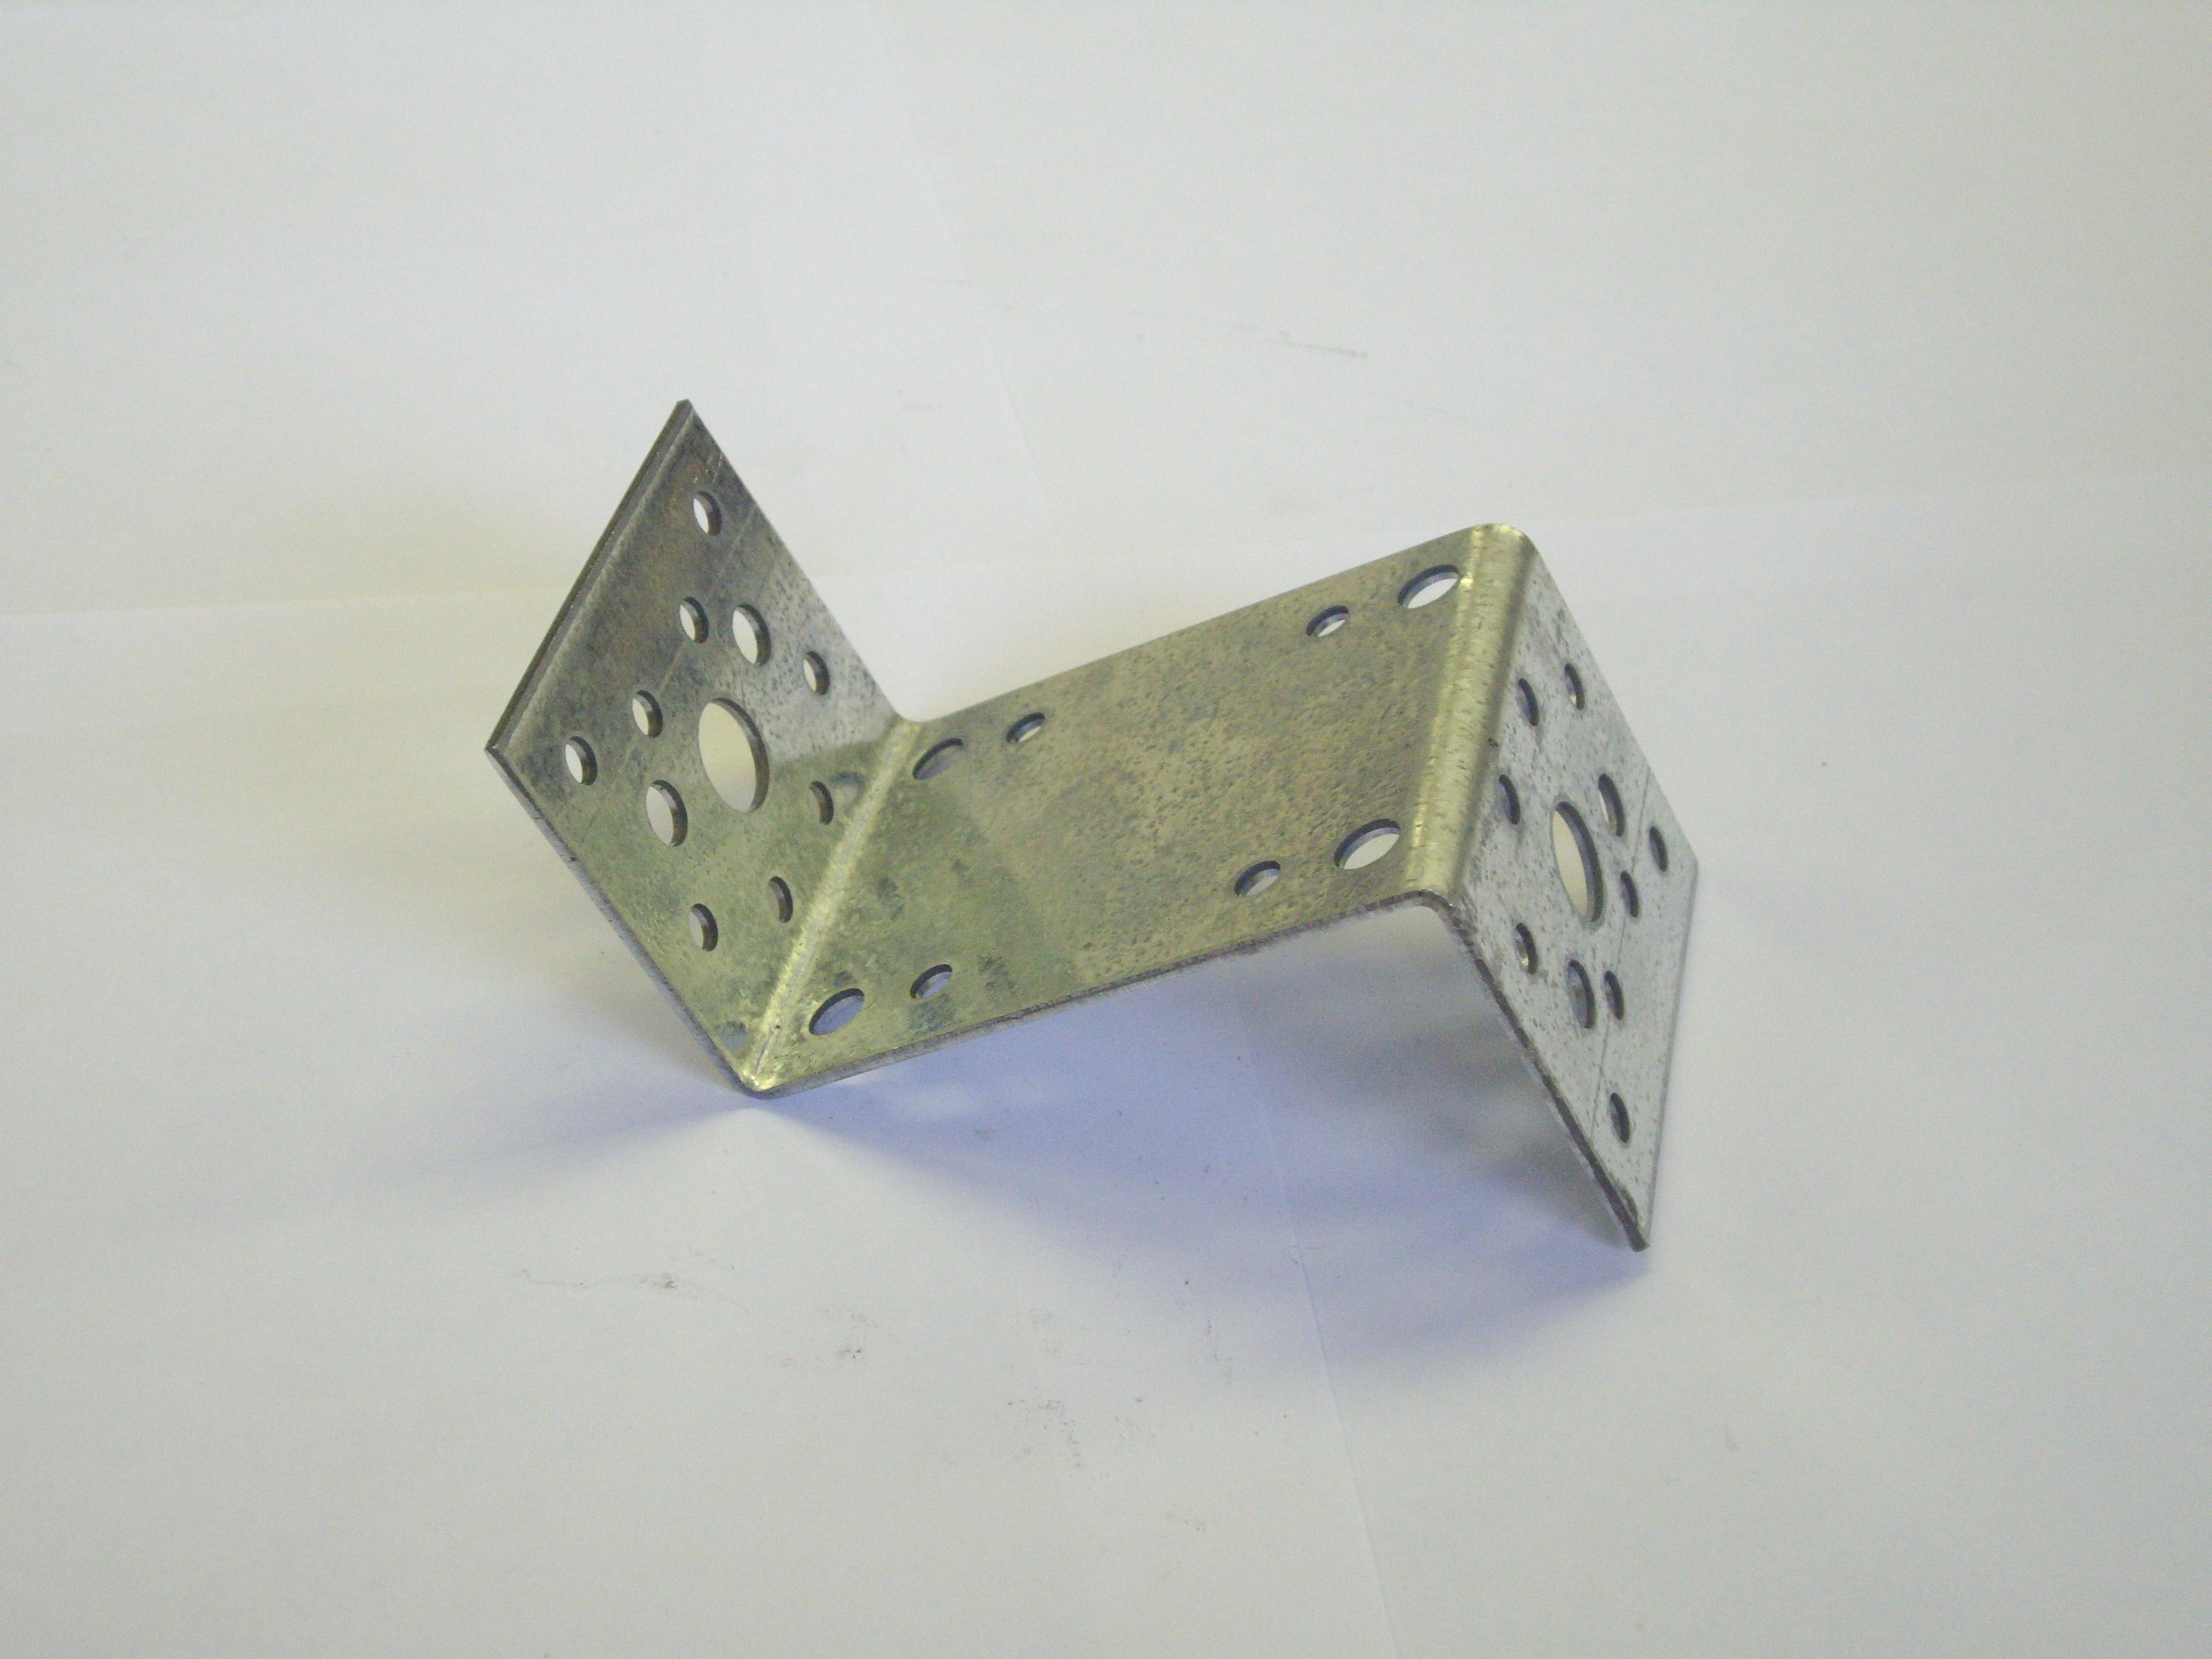 Уголок крепежный Z-образный оцинкованный 35х70х35х55х2 мм